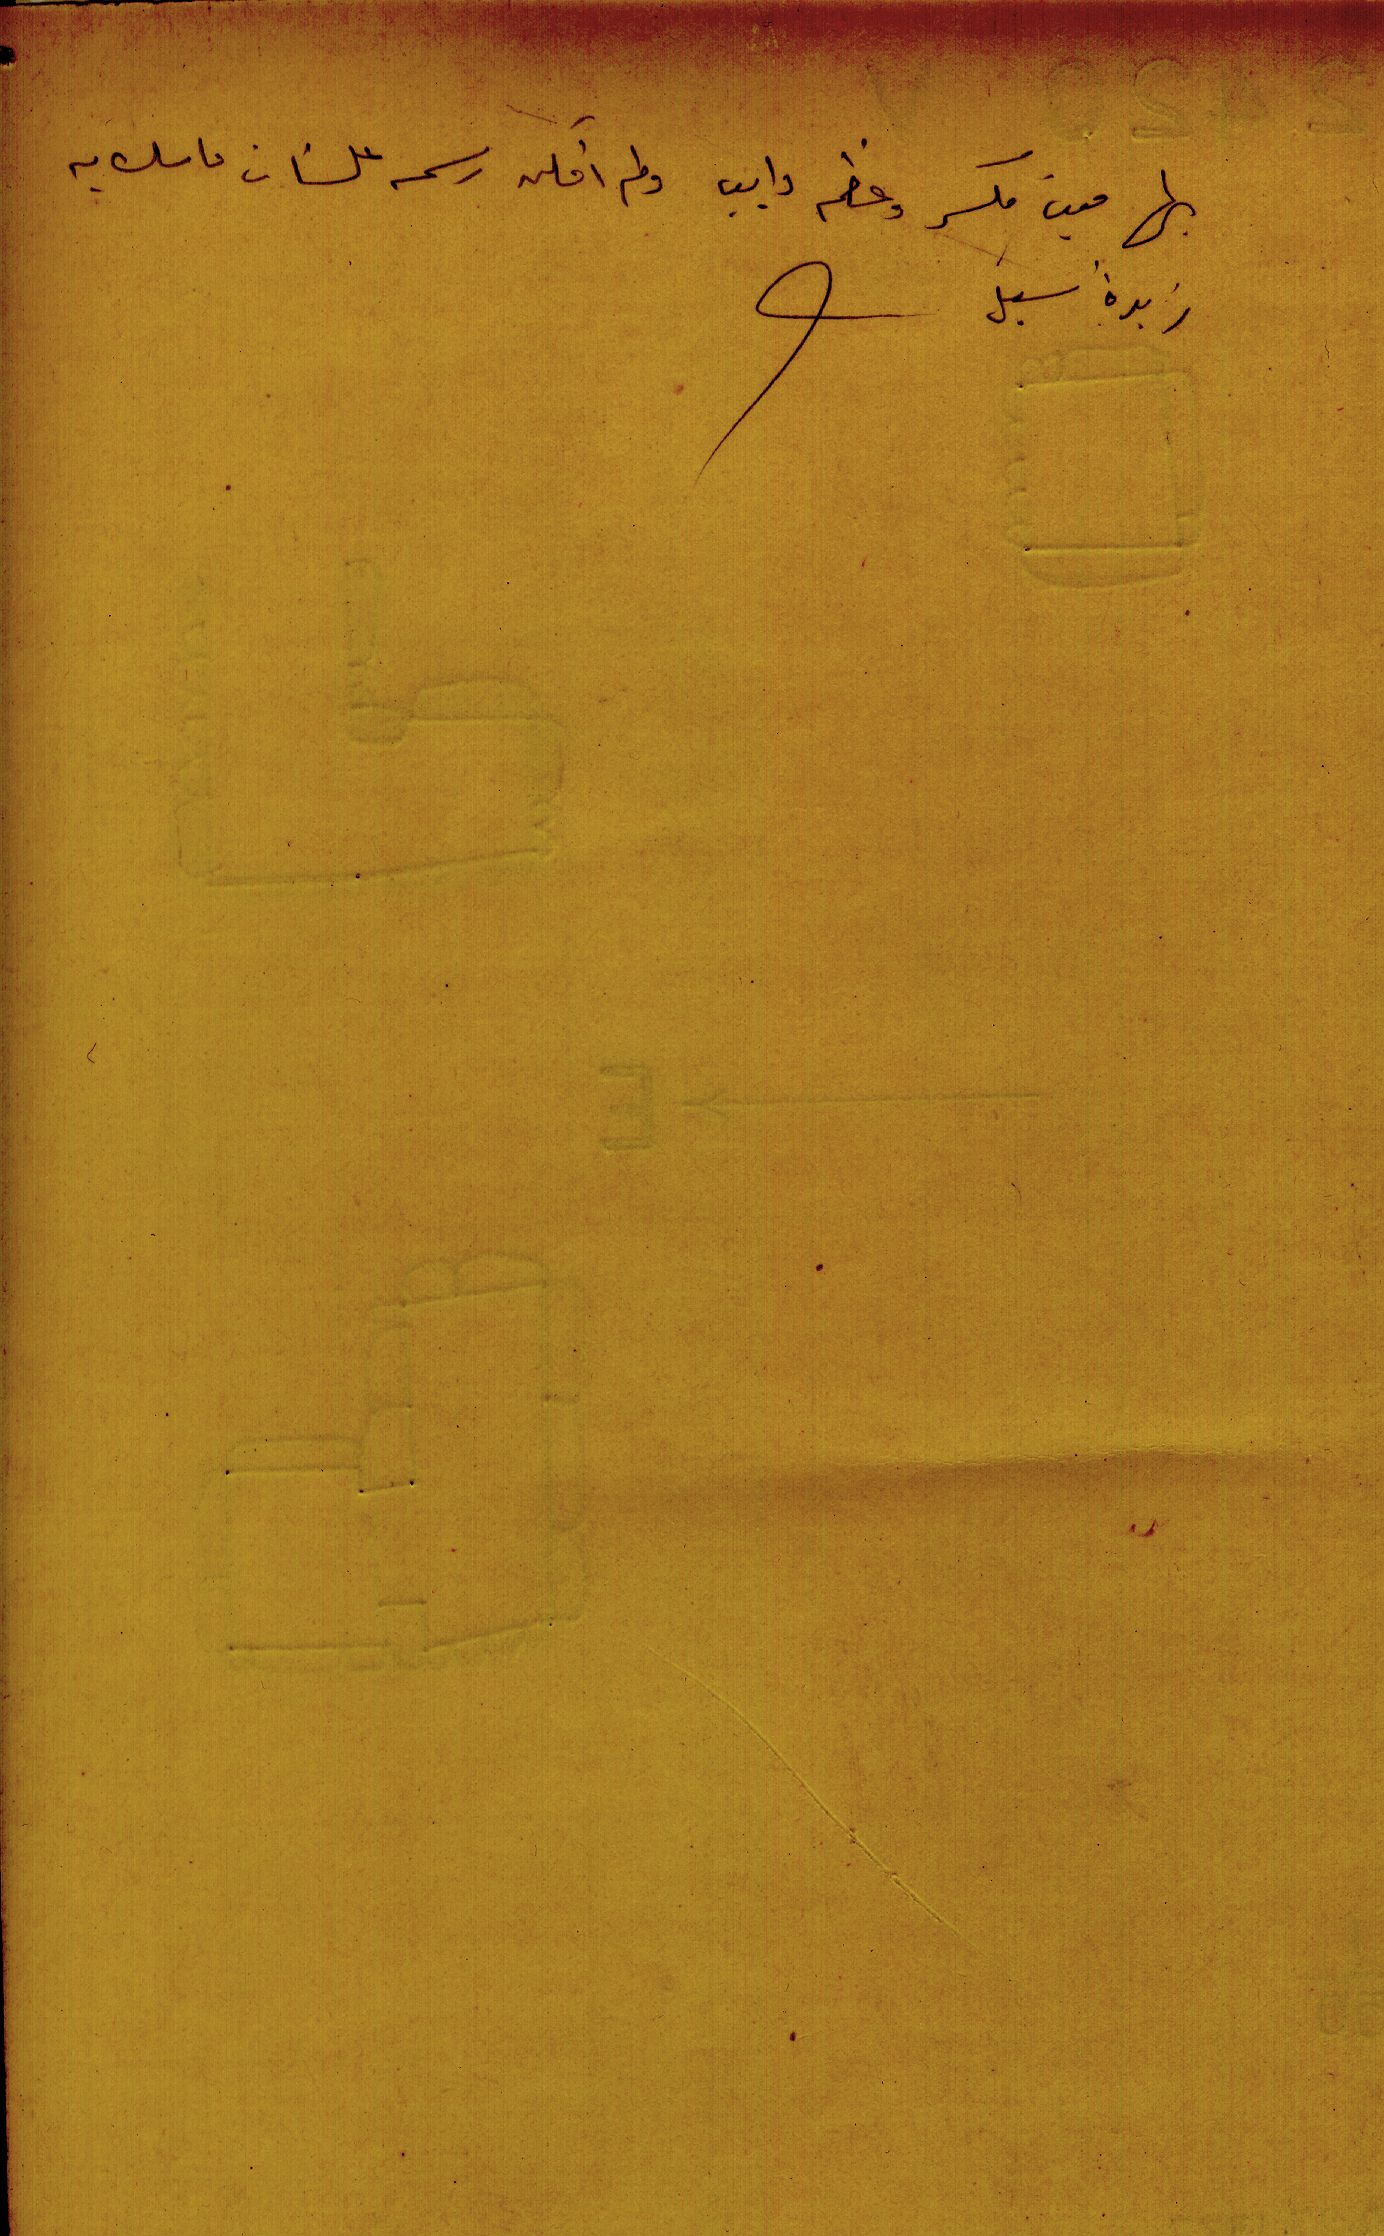 Notes: G 2420, Shaft V, notes (in Arabic)